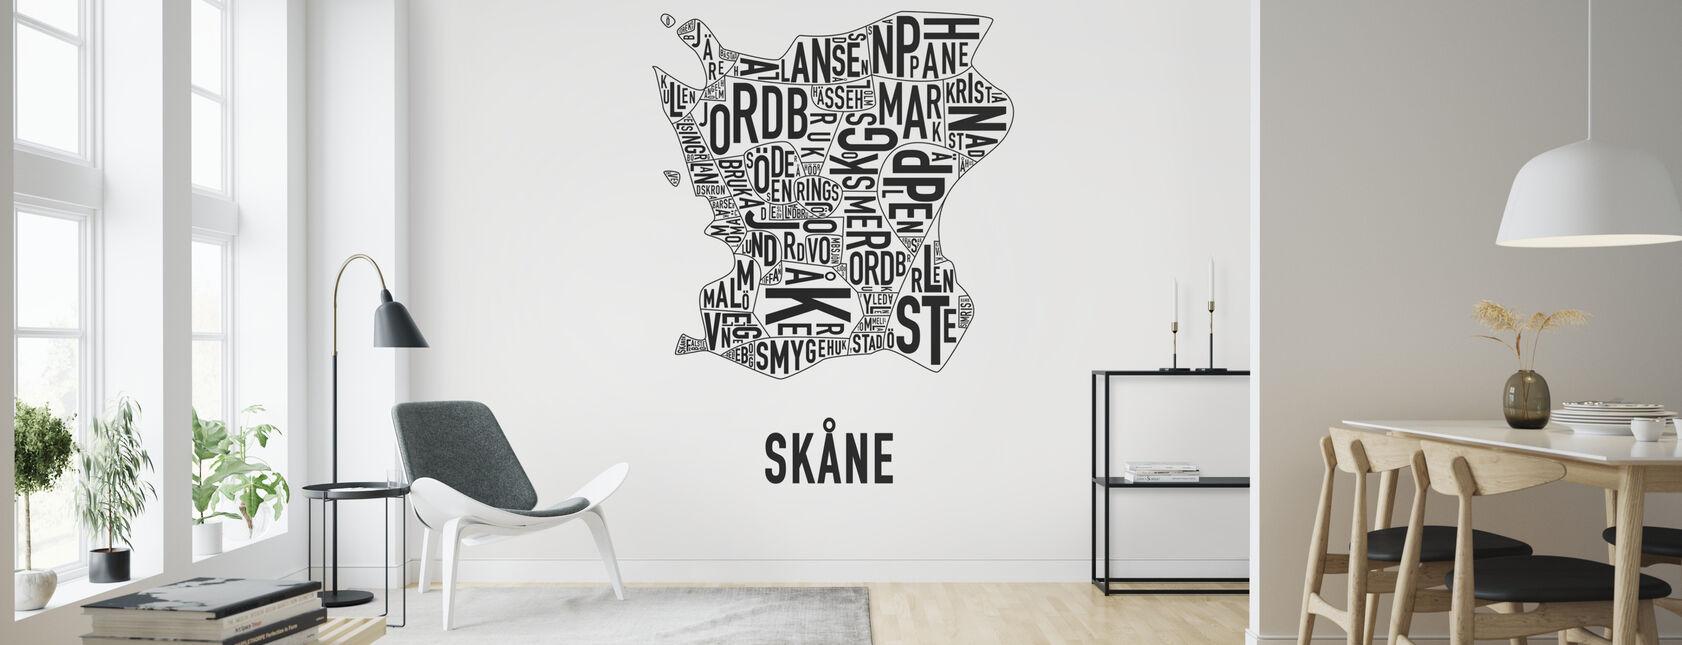 Skåne - Wallpaper - Living Room